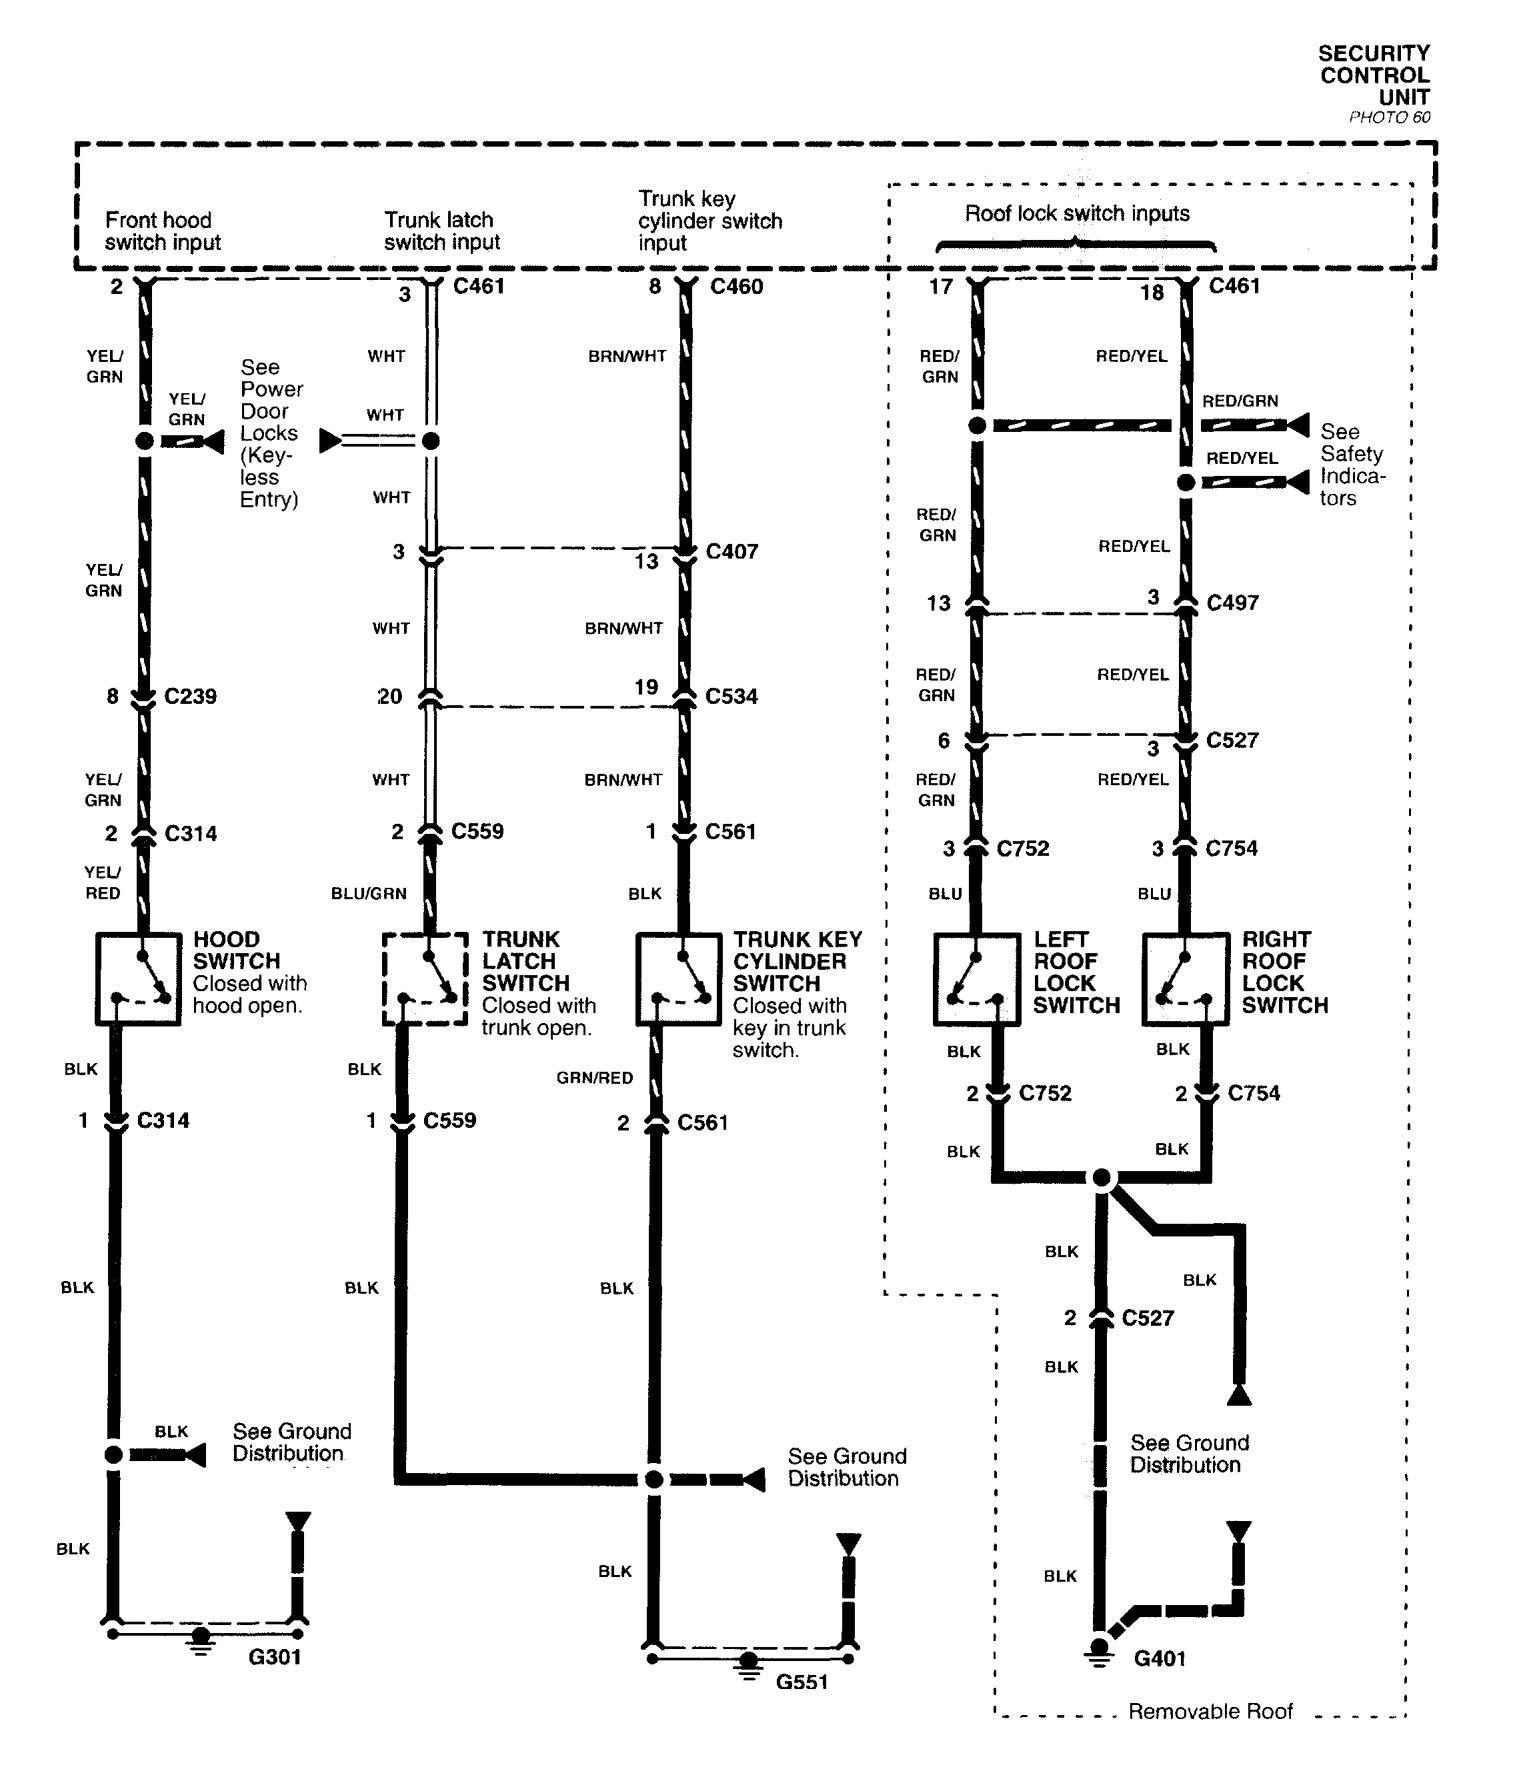 Acura Nsx  1997 - 2004  - Wiring Diagrams  Anti